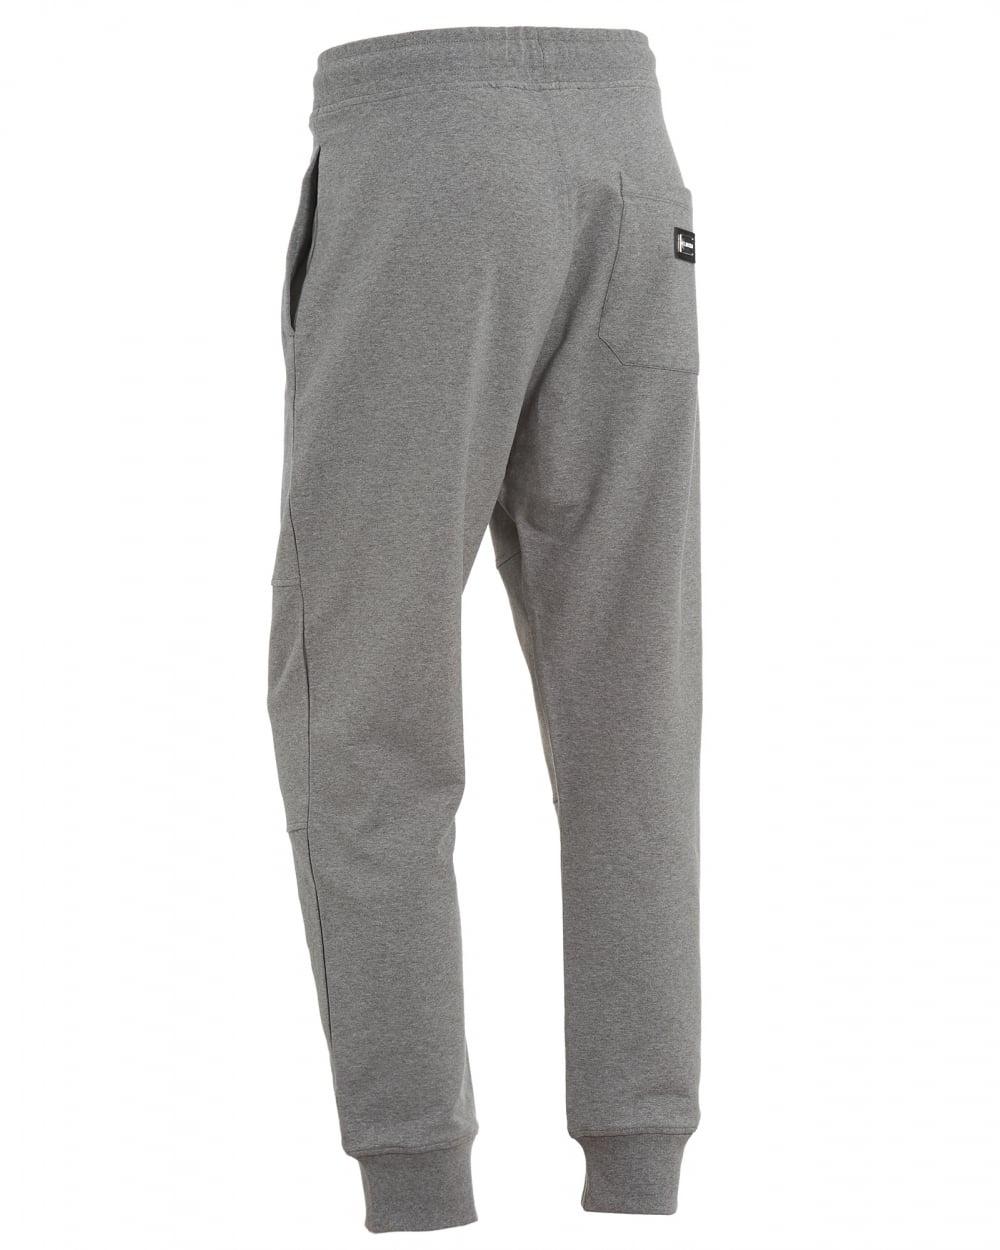 fresh styles really cheap new season Mens Cuff Trackpants, Back Pocket Badge Grey Sweatpants